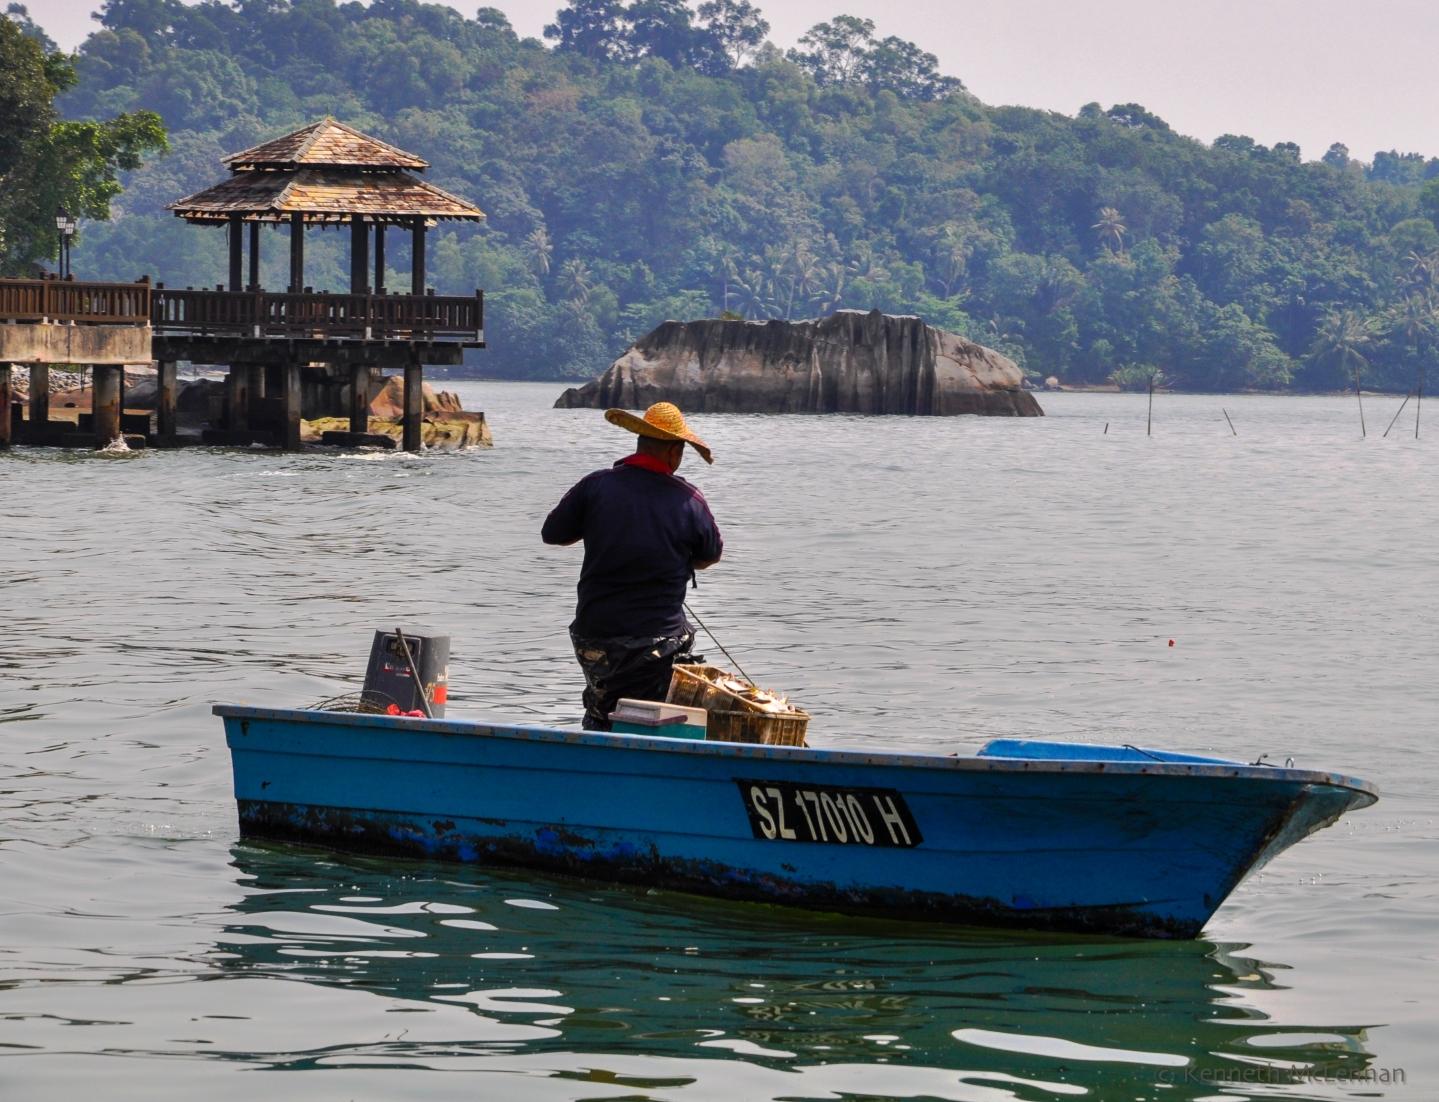 Pulau Ubin, SP-5